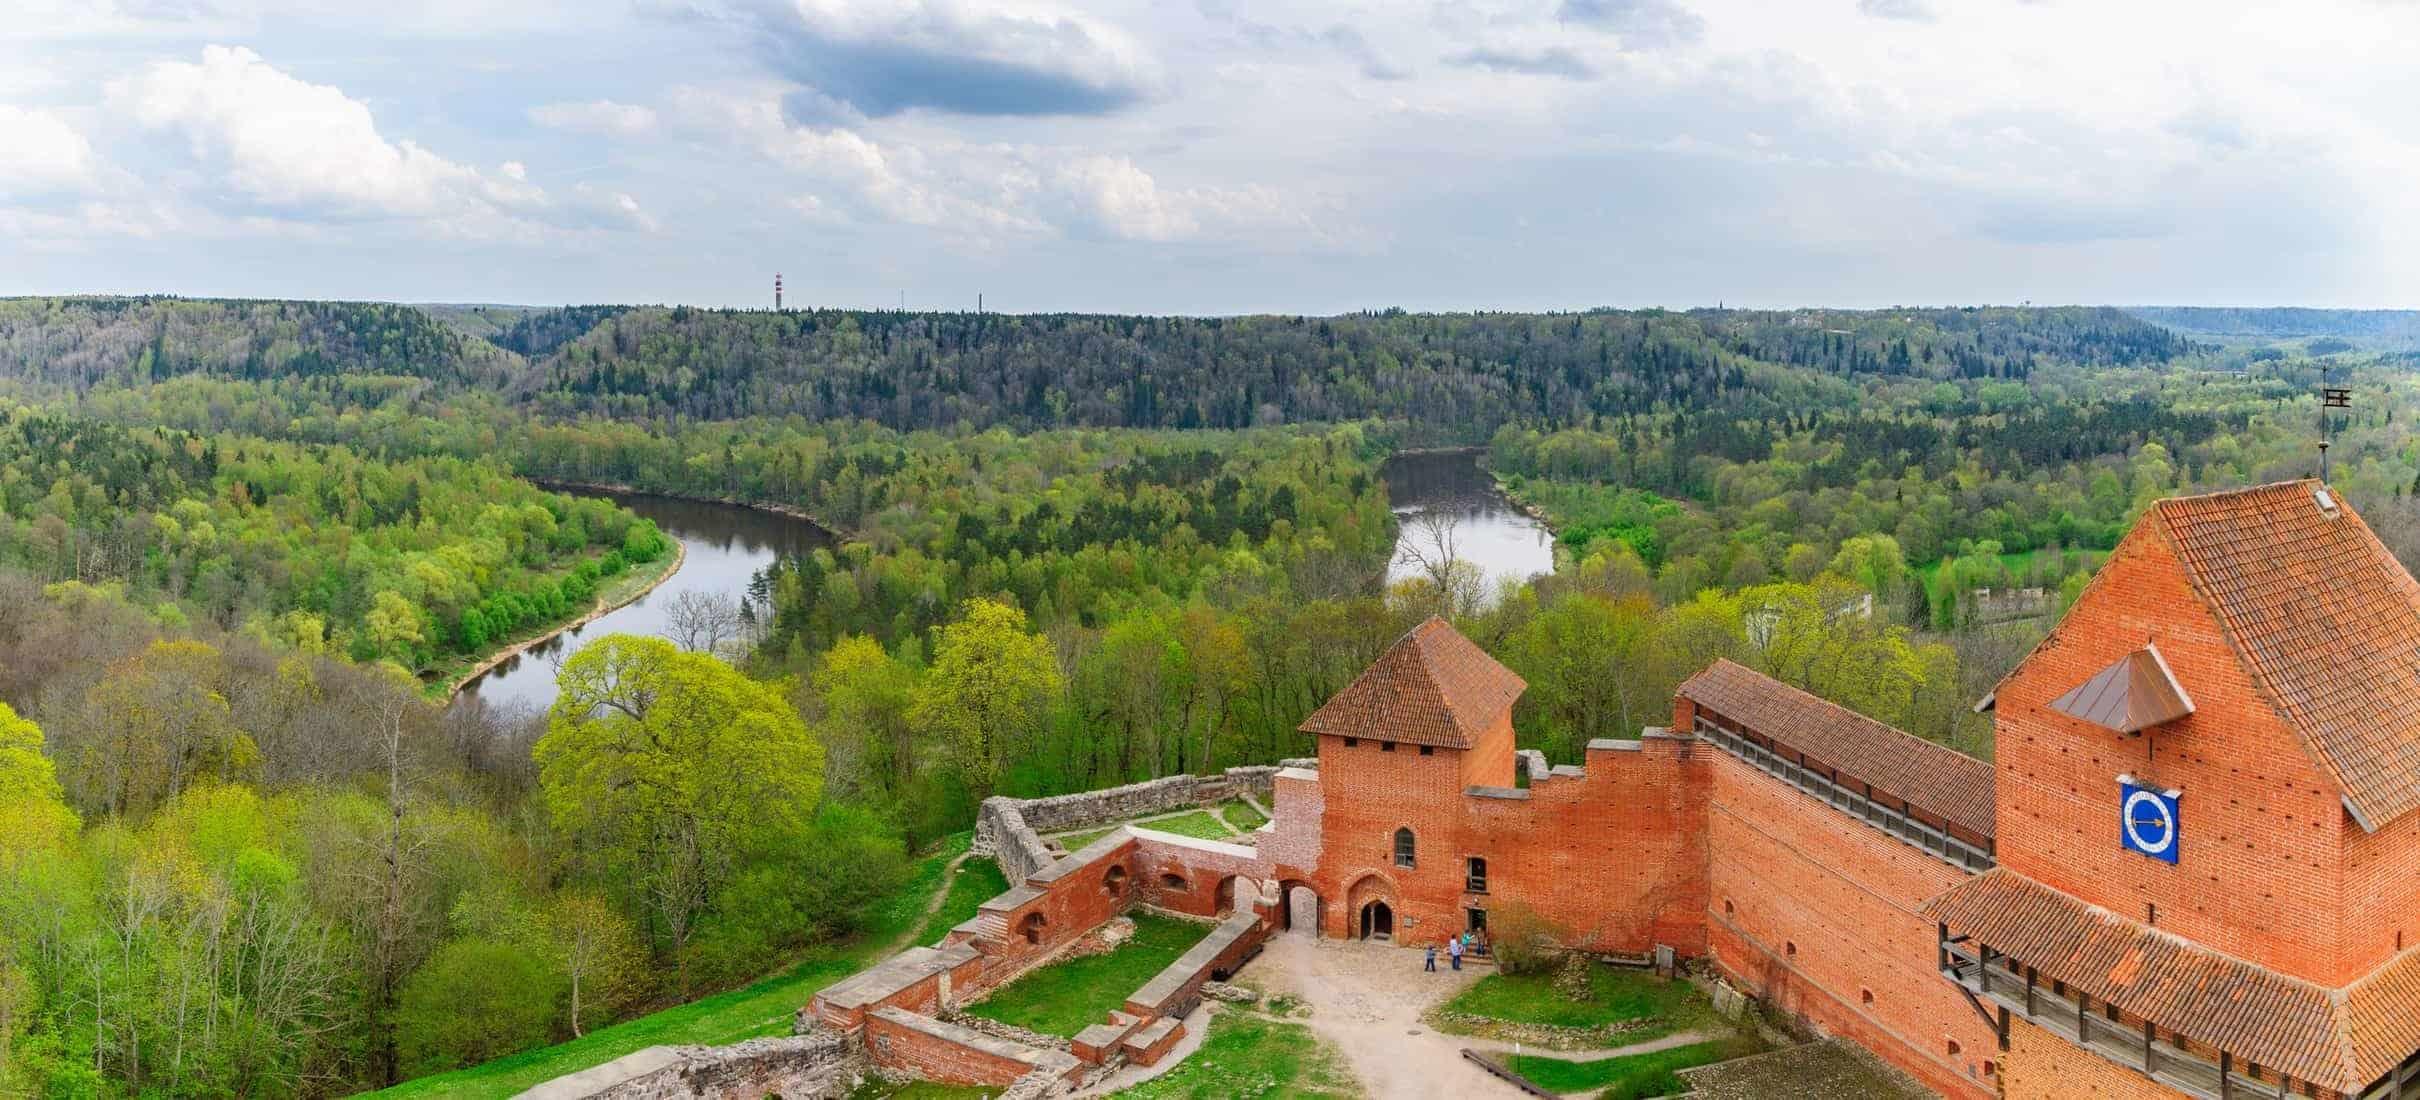 Bird view on Turaida castle and springtime Gauja river valley in Sigulda, Latvia